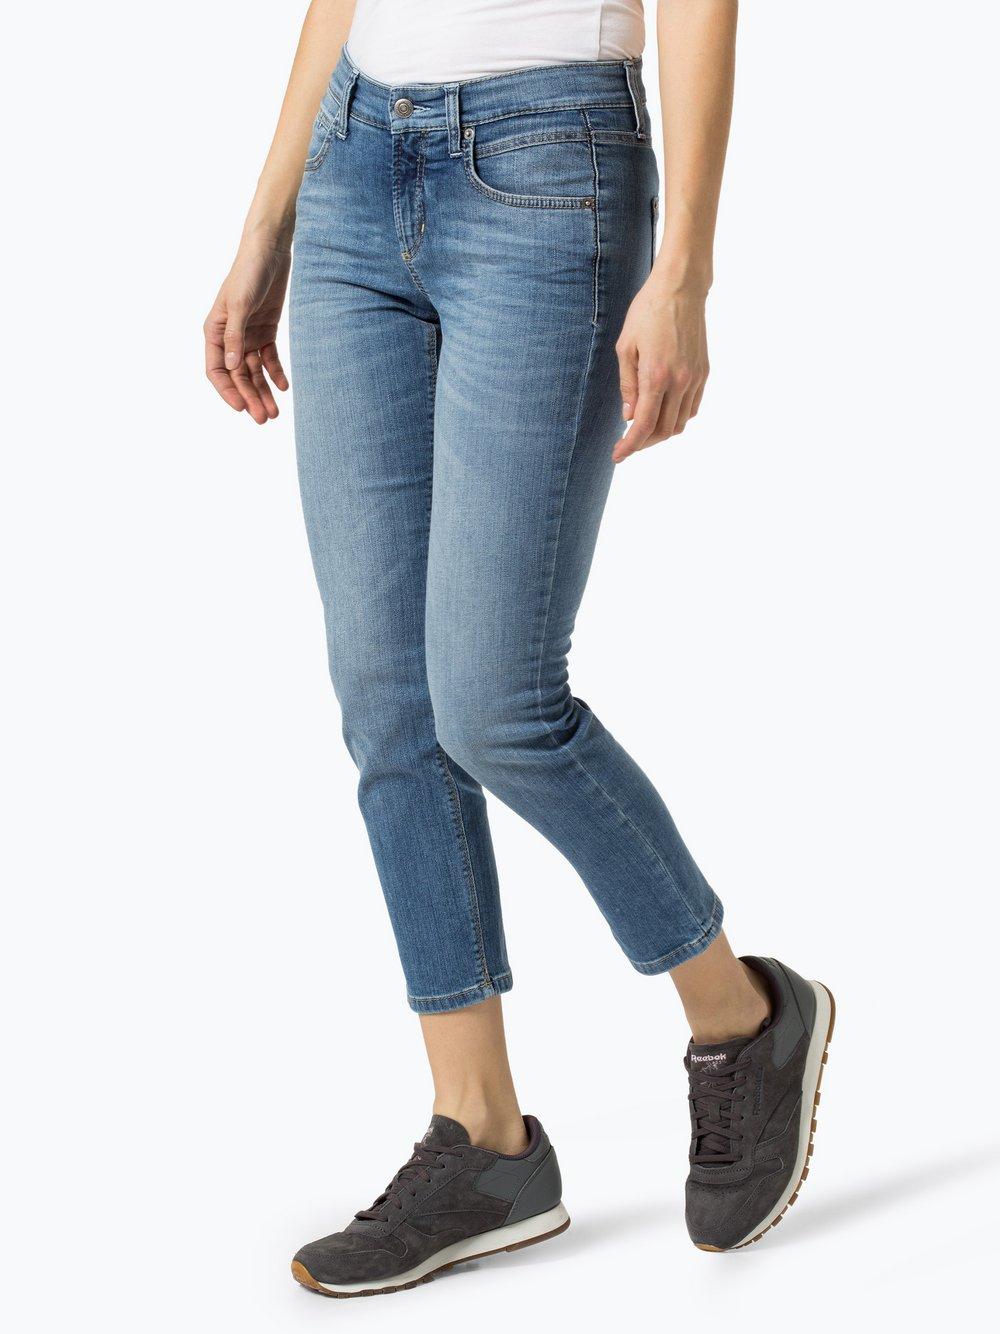 898d176a746fc5 cambio-damen-jeans-pina pdmain 387748-0001 modelfront 1.jpg